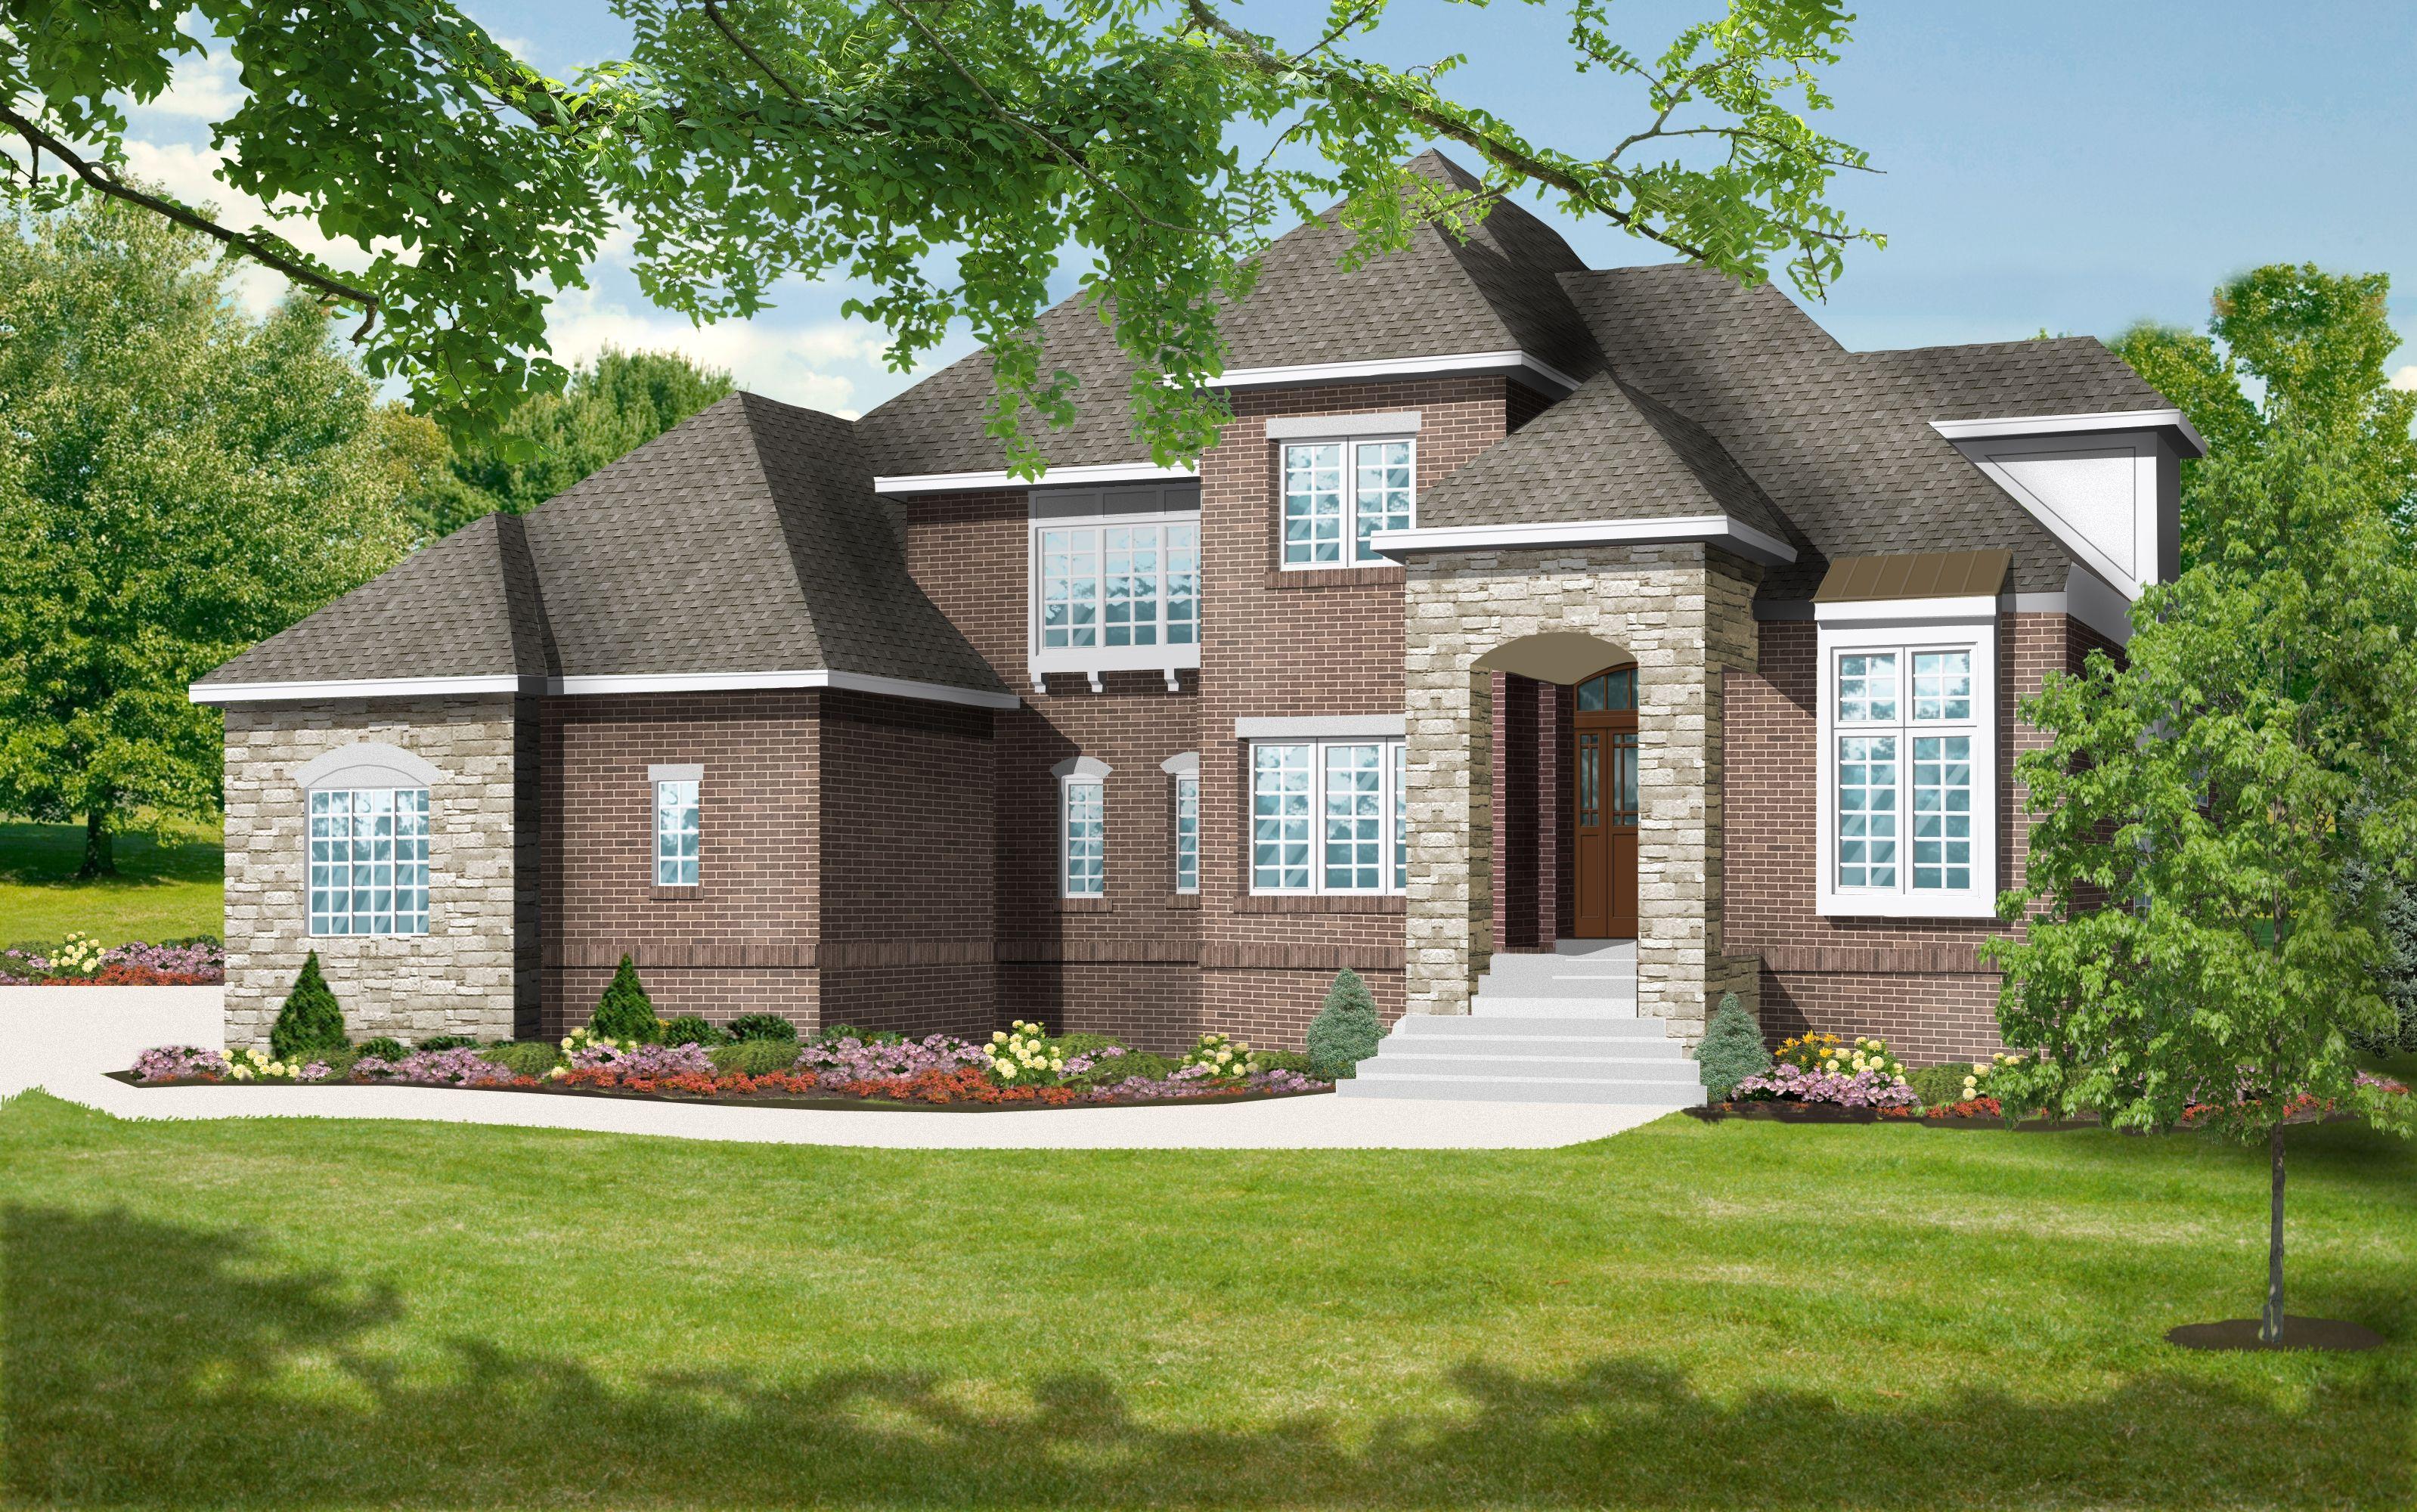 The Boschi Bella Casa by Daniels Hicks Homes